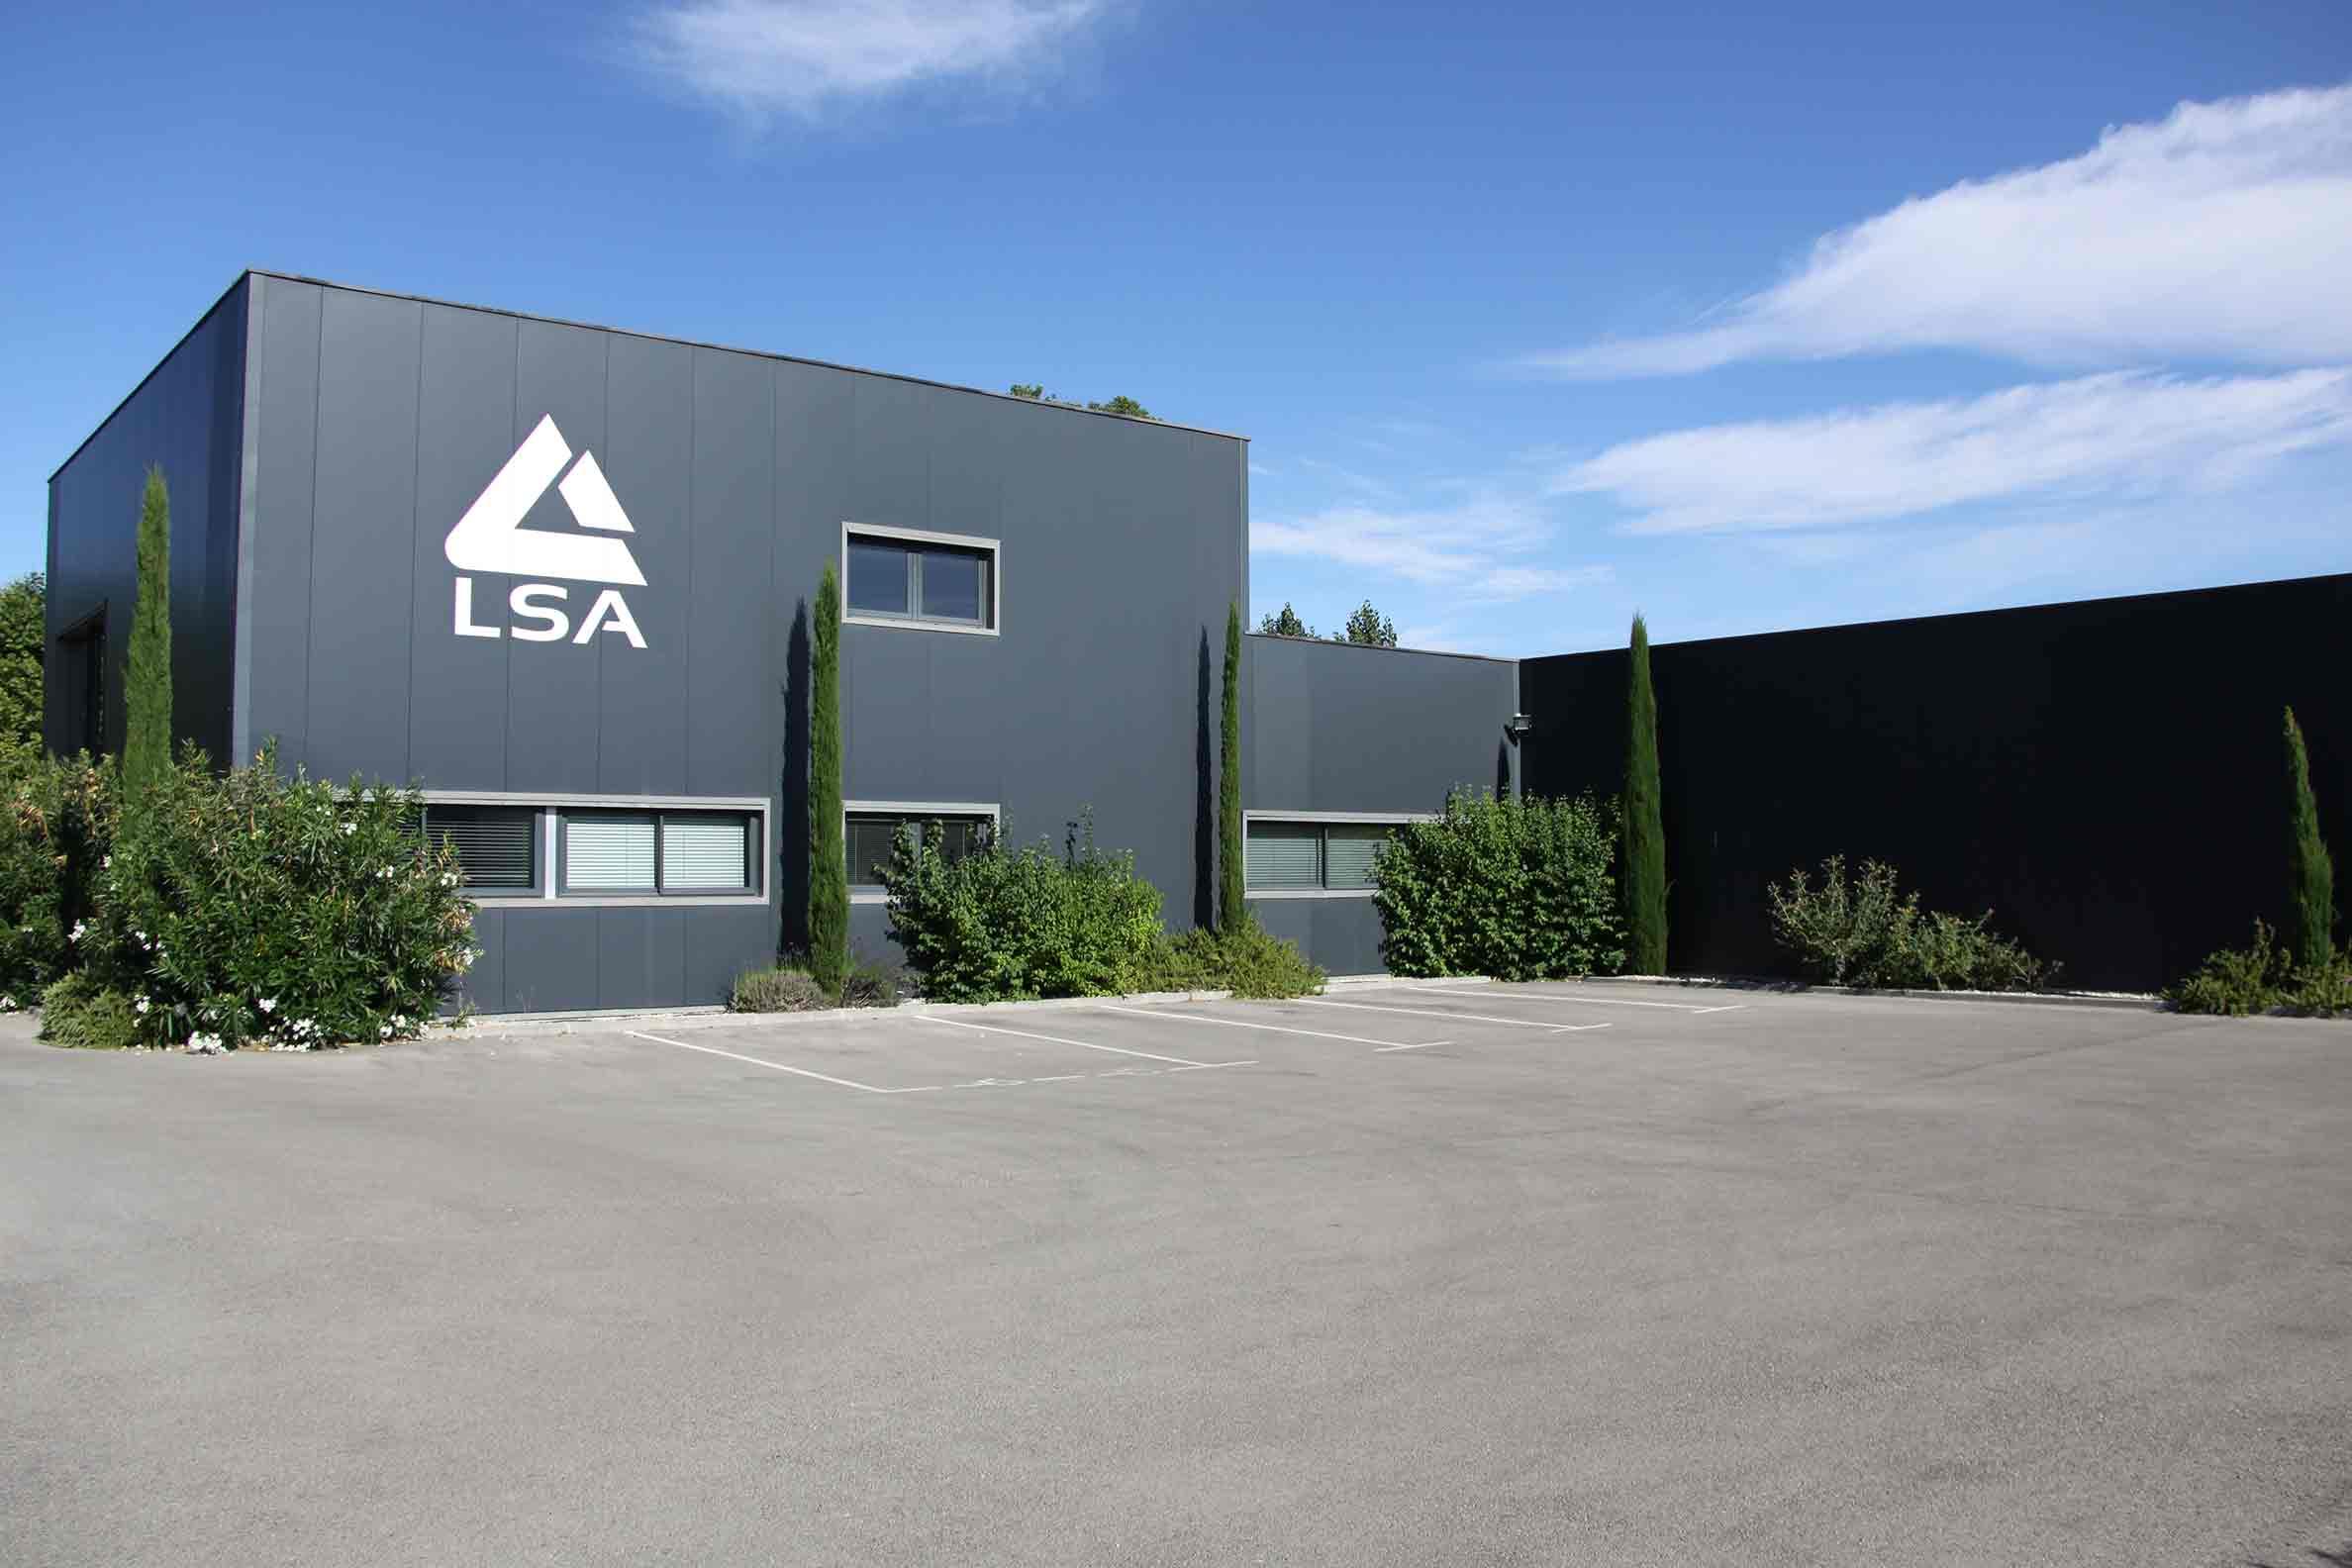 Locaux LSA Solutions